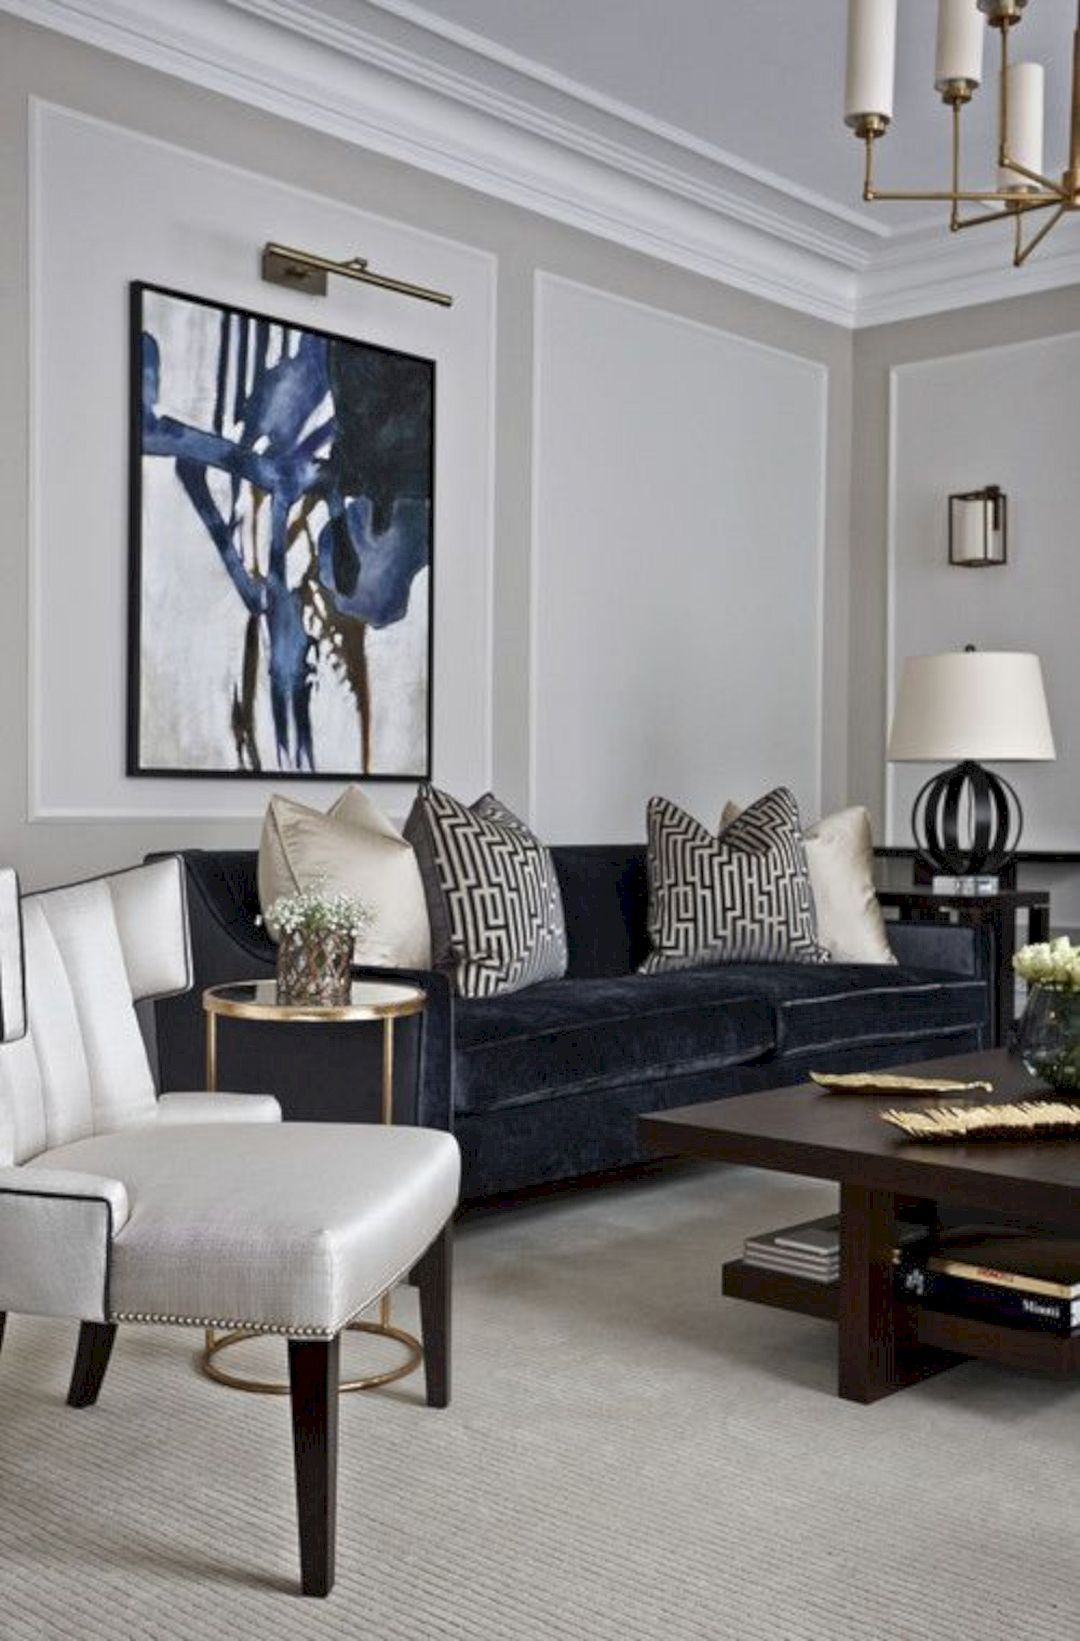 Delicieux 15 Interior Design Ideas For Classic Living Room  Https://www.futuristarchitecture.